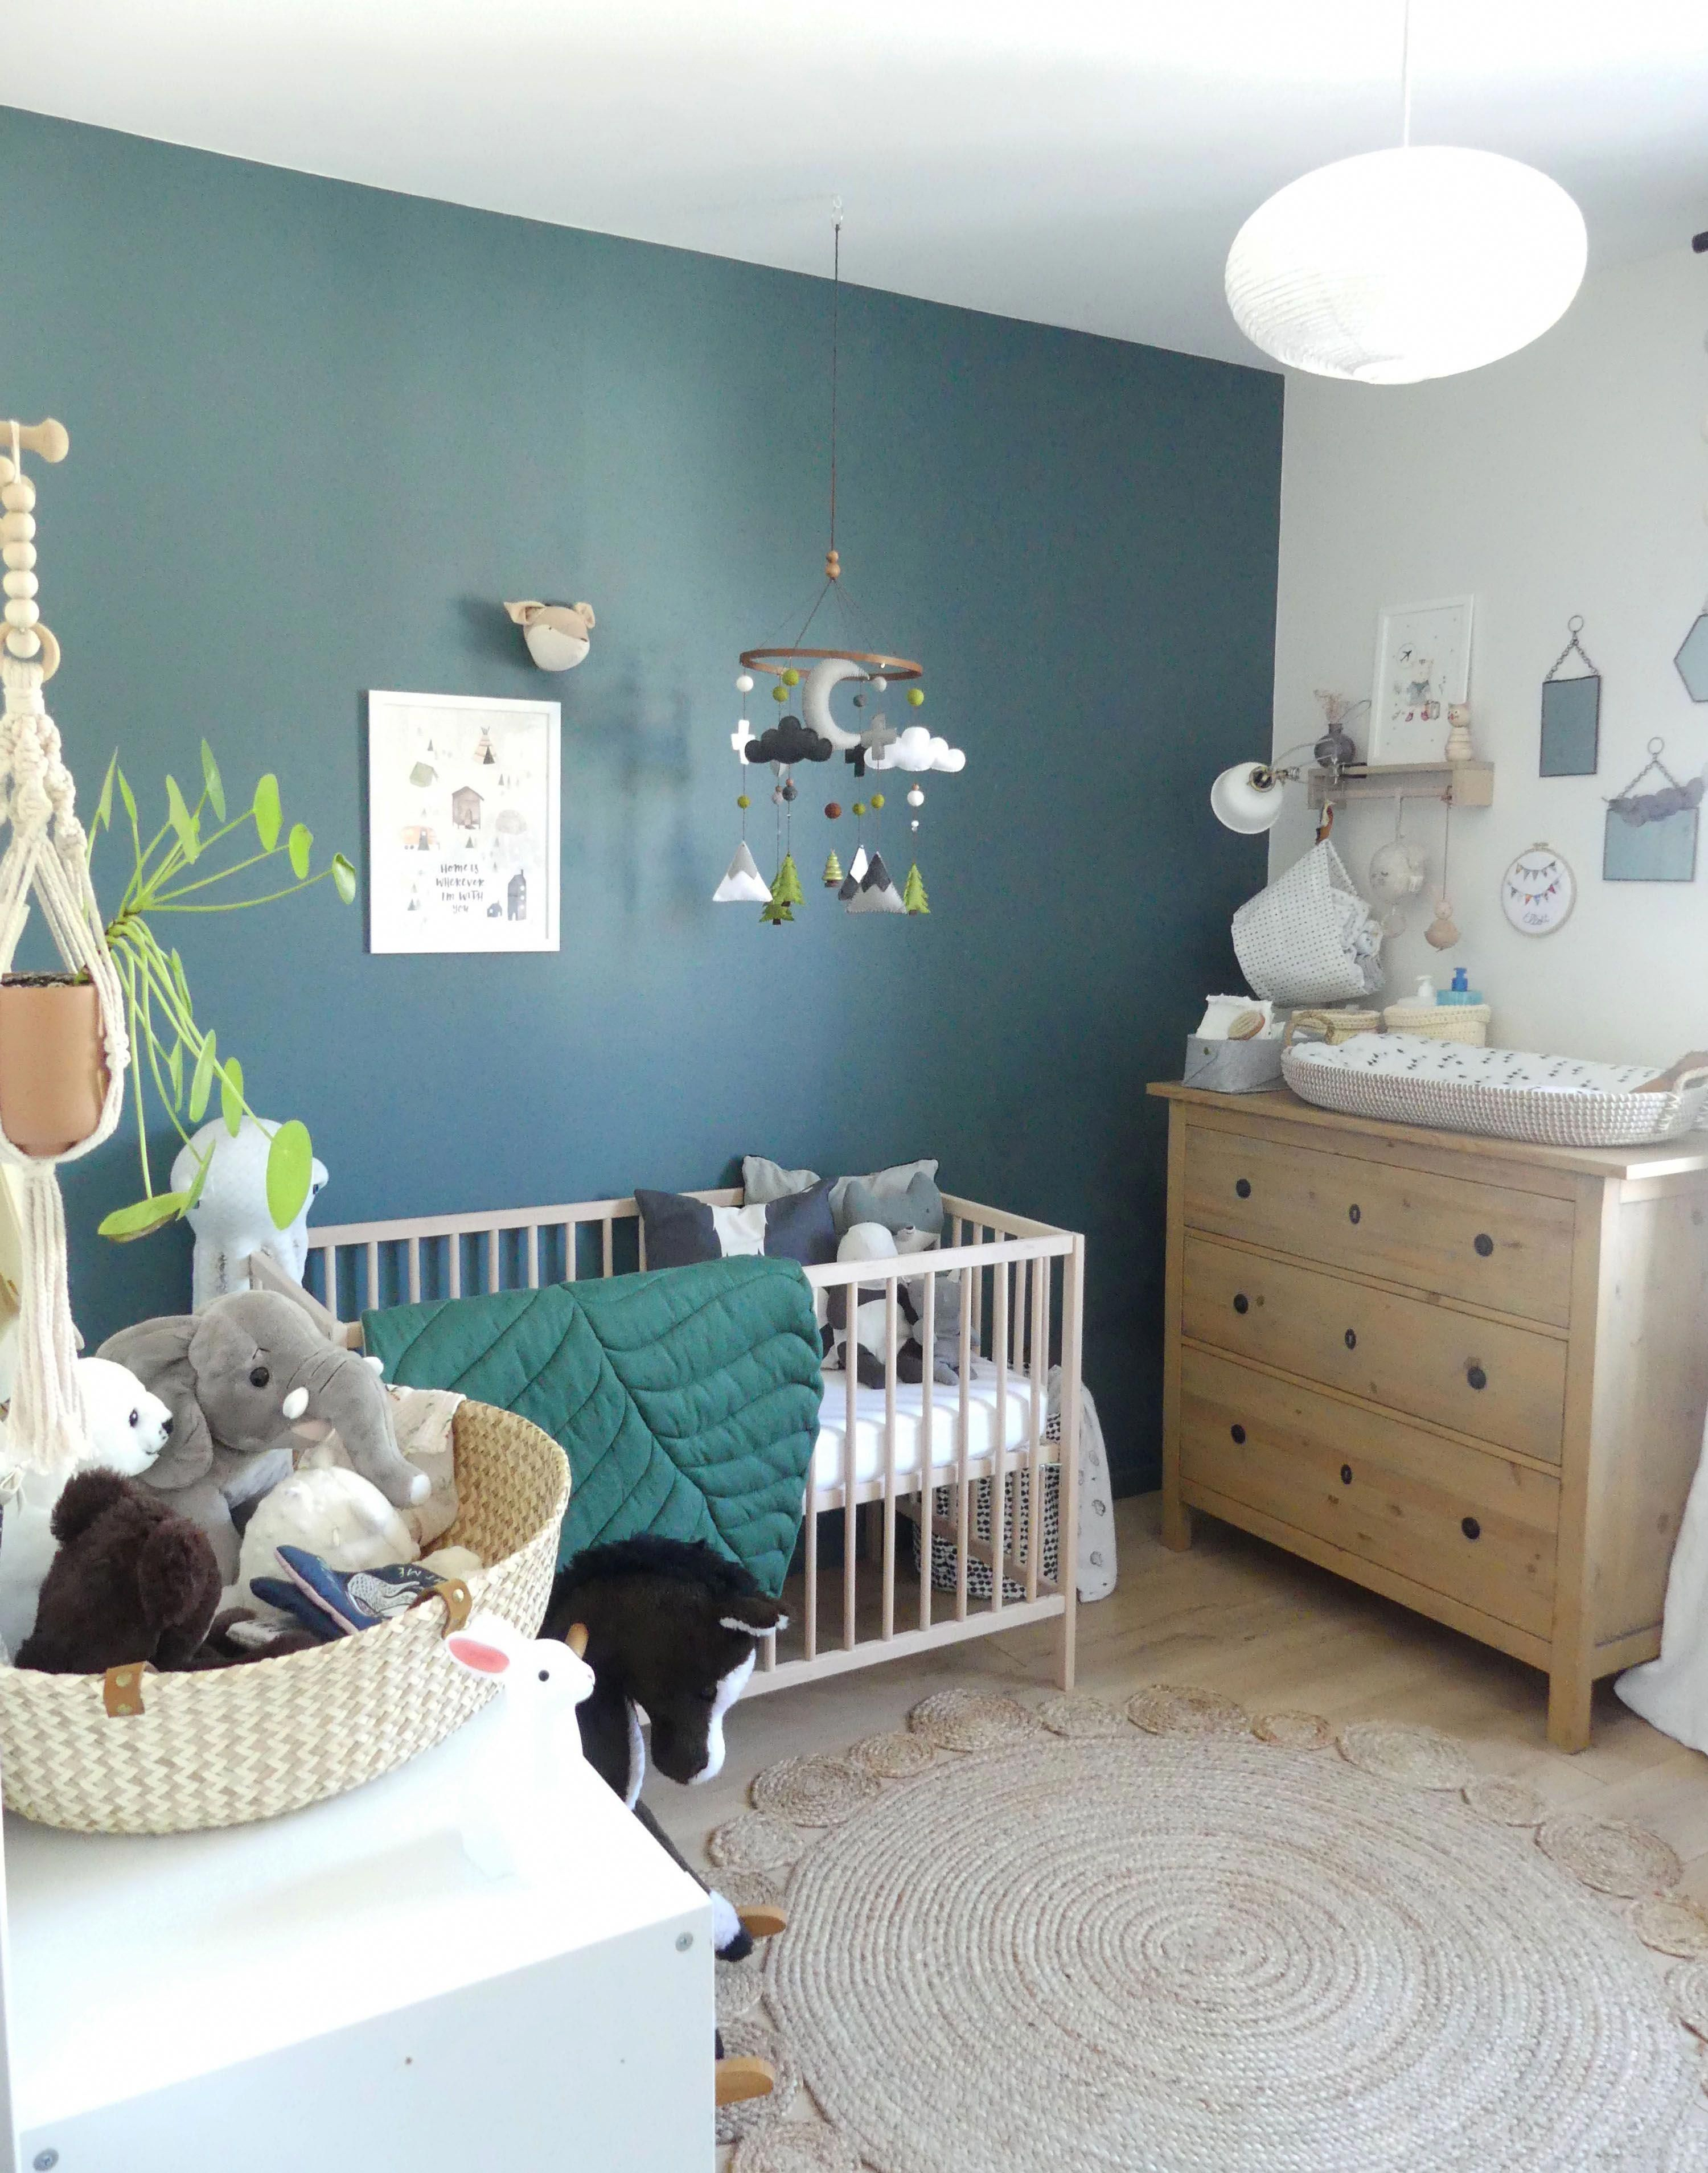 Epingle Par Palo Mita Sur Peinture Garcons Chambre De Bebe